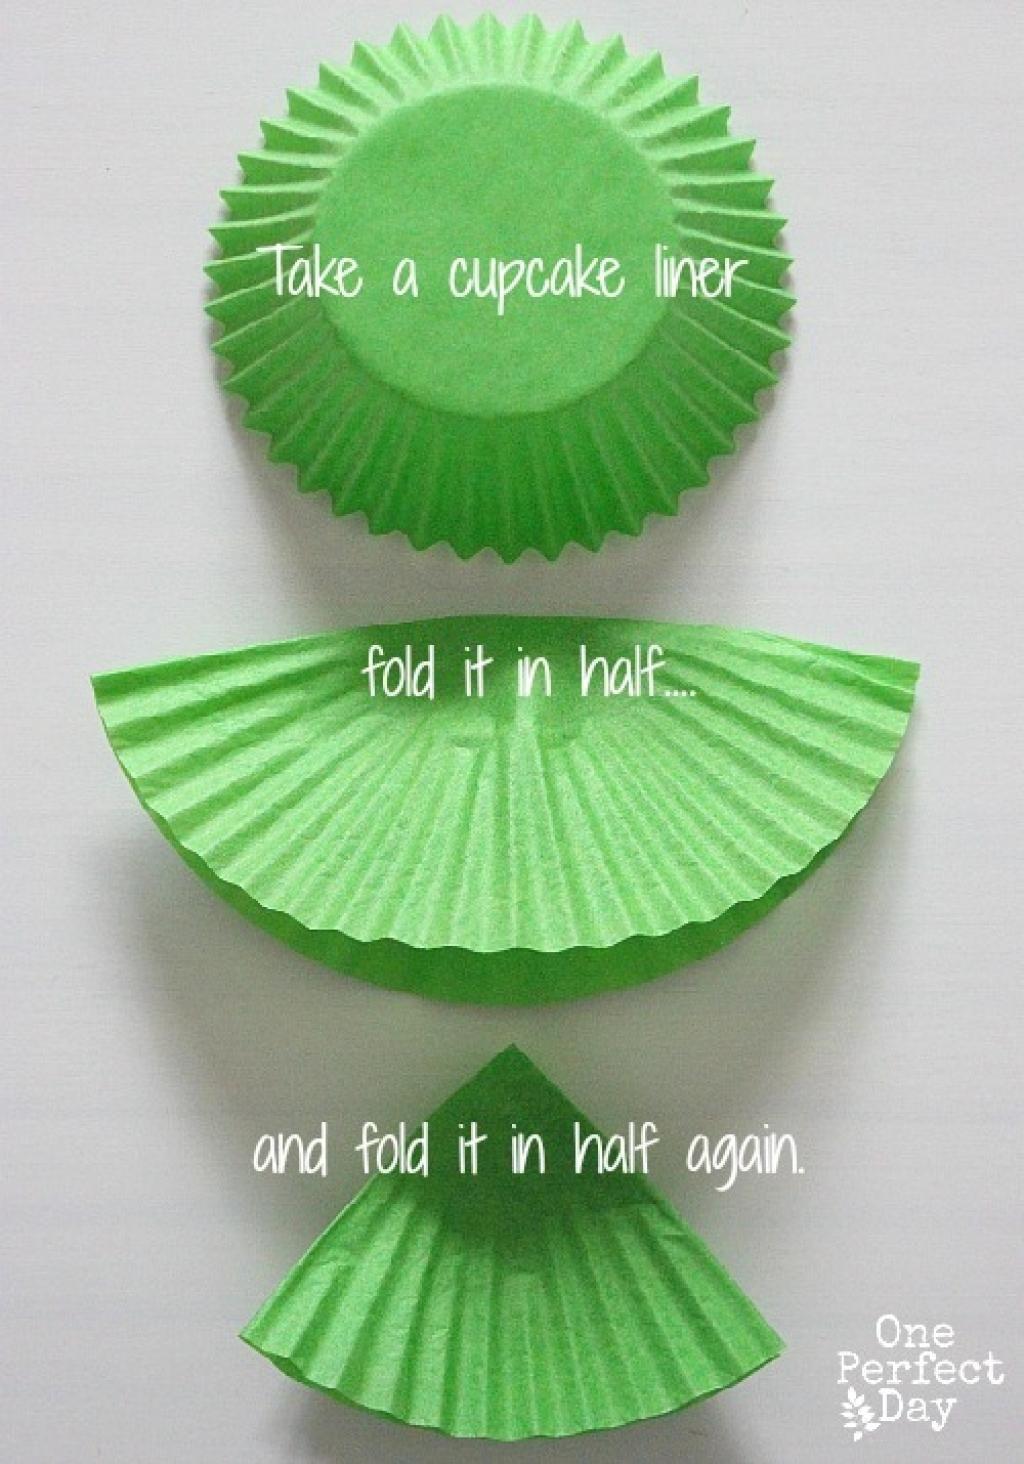 Sapin de nol moules en papier cupcake carte de nol dcorations explore cupcake paper crafts cupcake liners and more jeuxipadfo Gallery